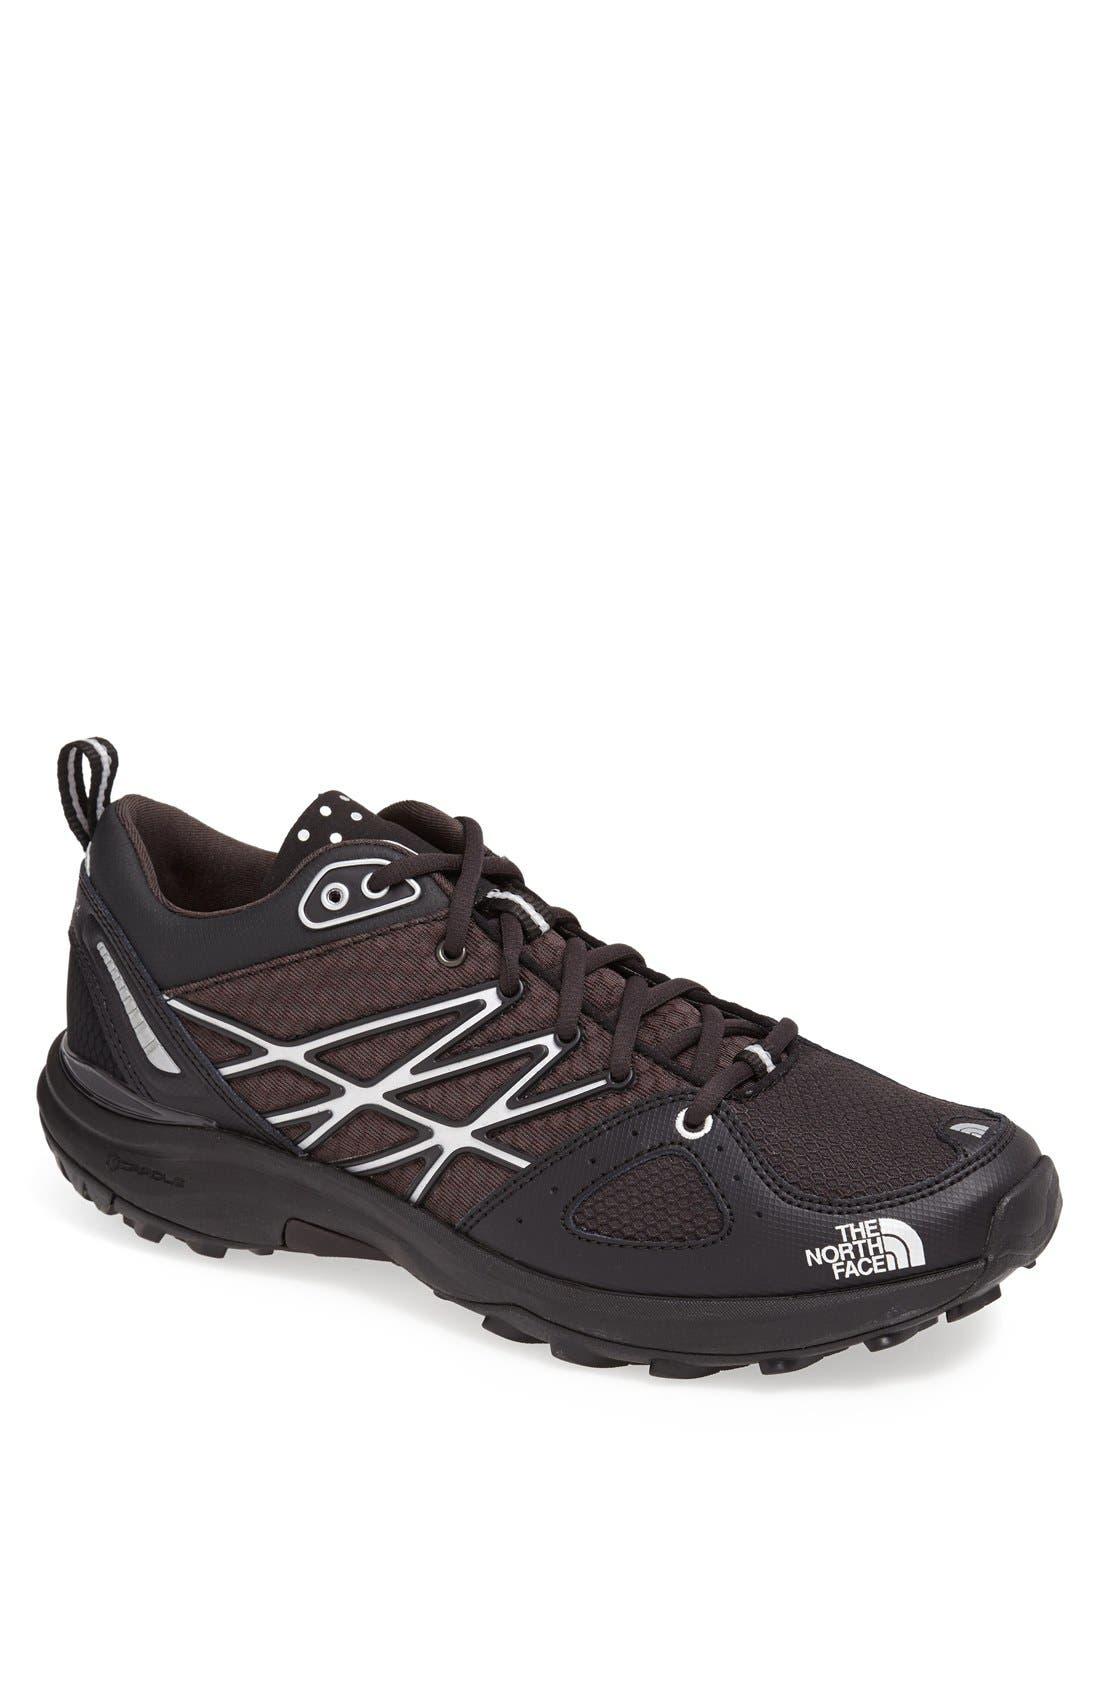 Alternate Image 1 Selected - The North Face 'Ultra Fastpack' Hiking Shoe (Men)